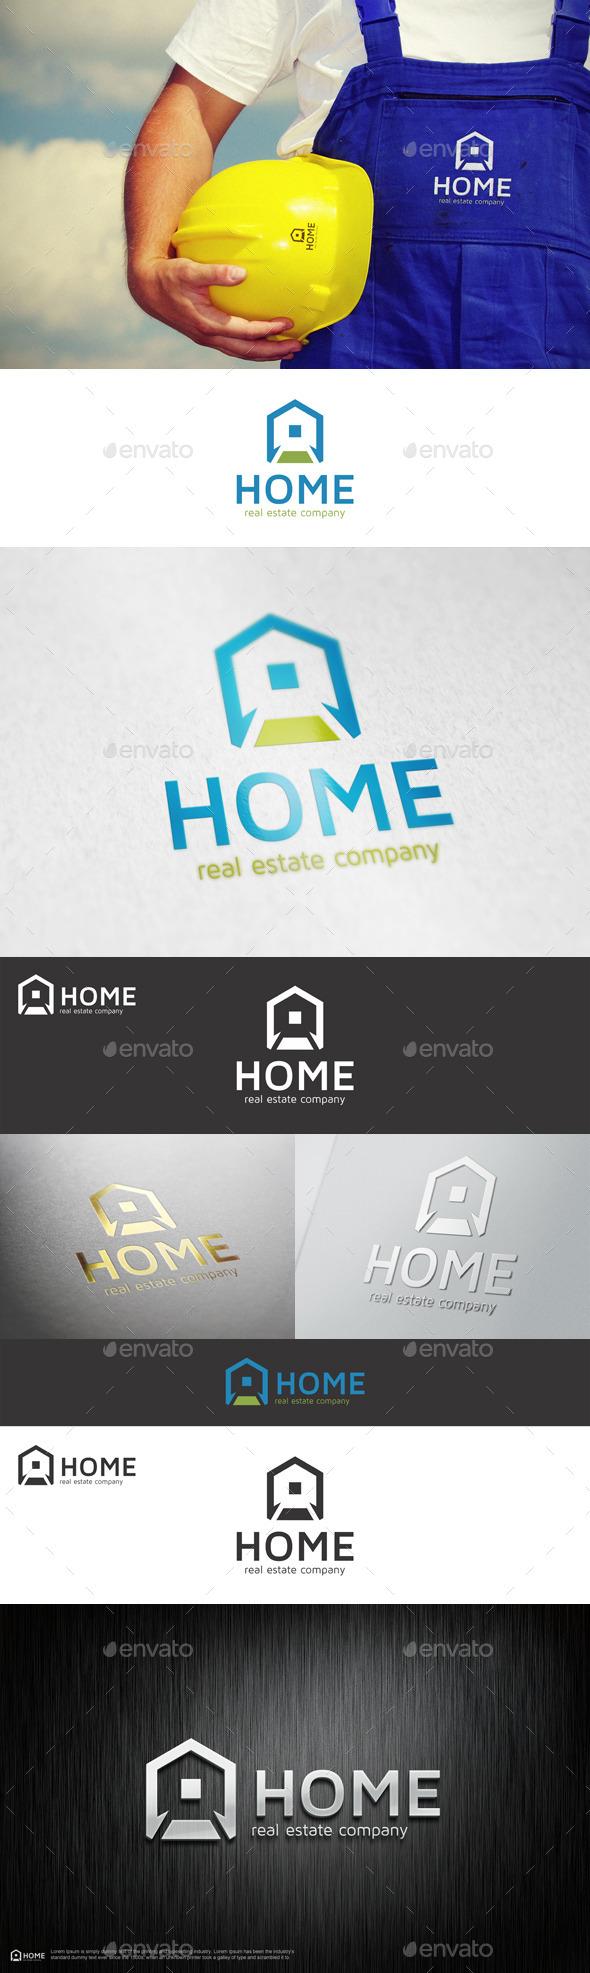 Home Real Estate Company Logo